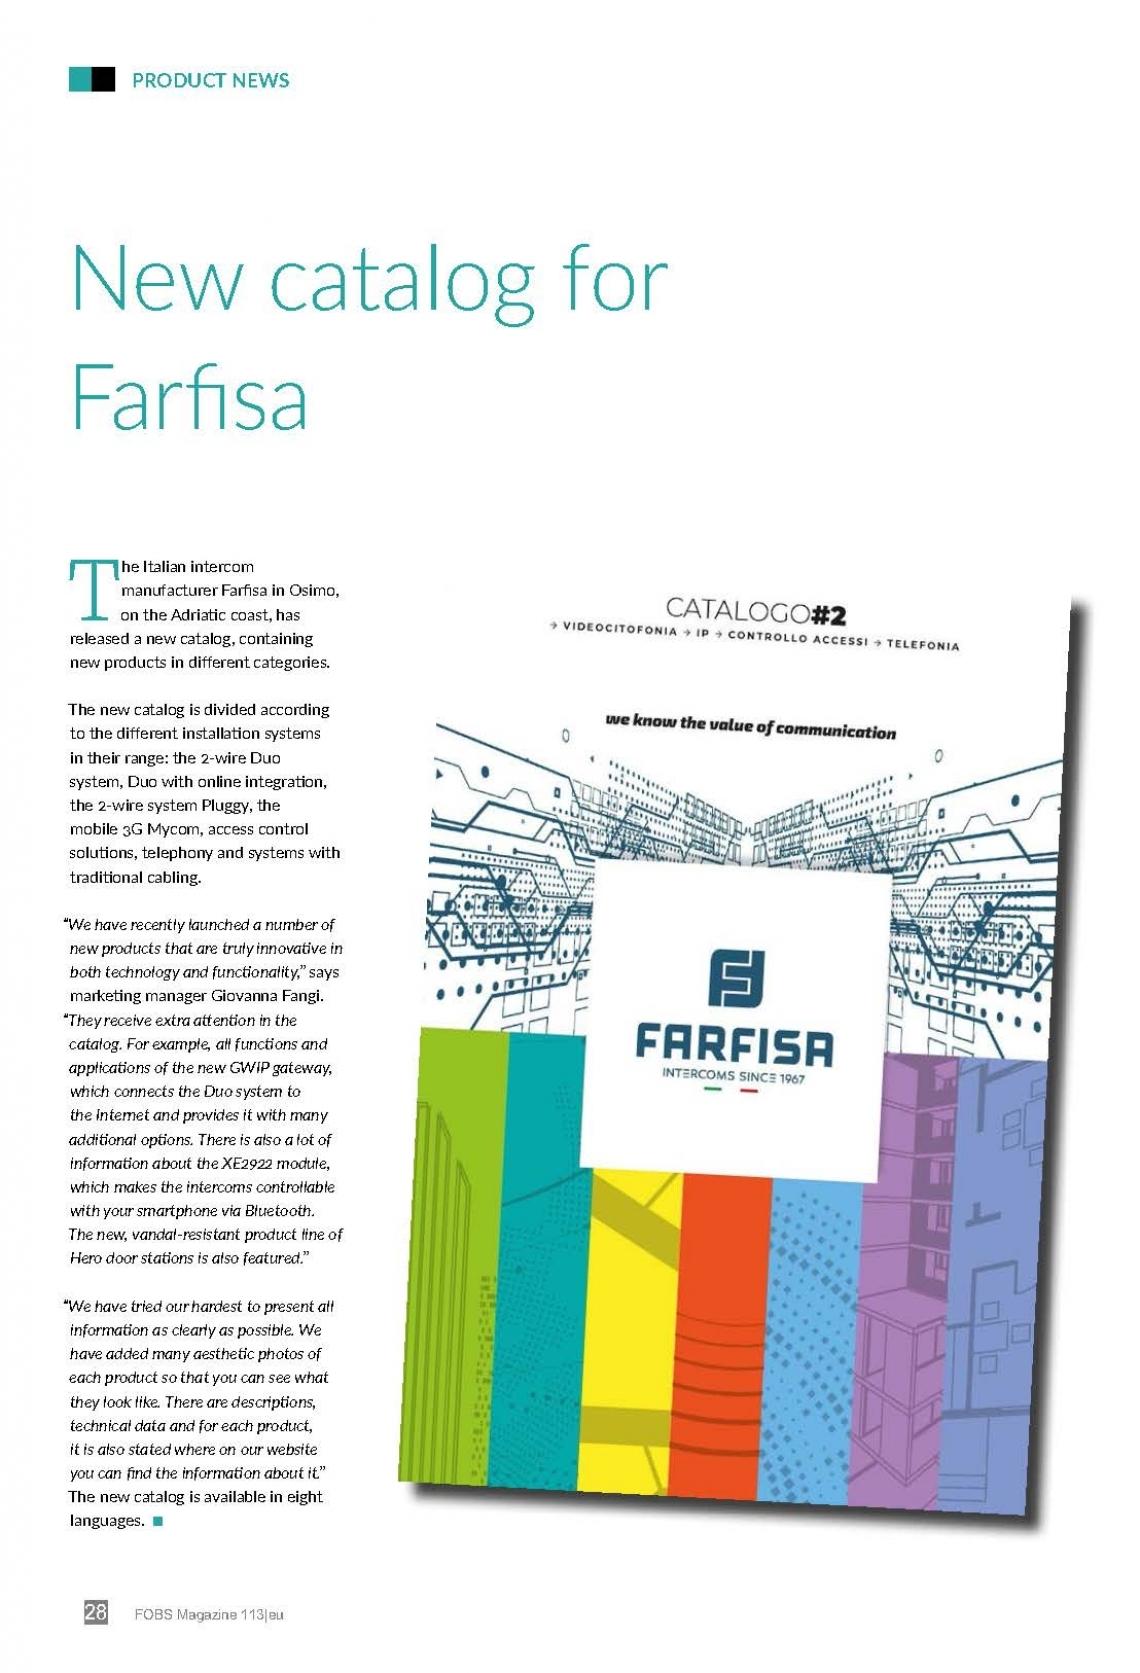 New Catalog for Farfisa